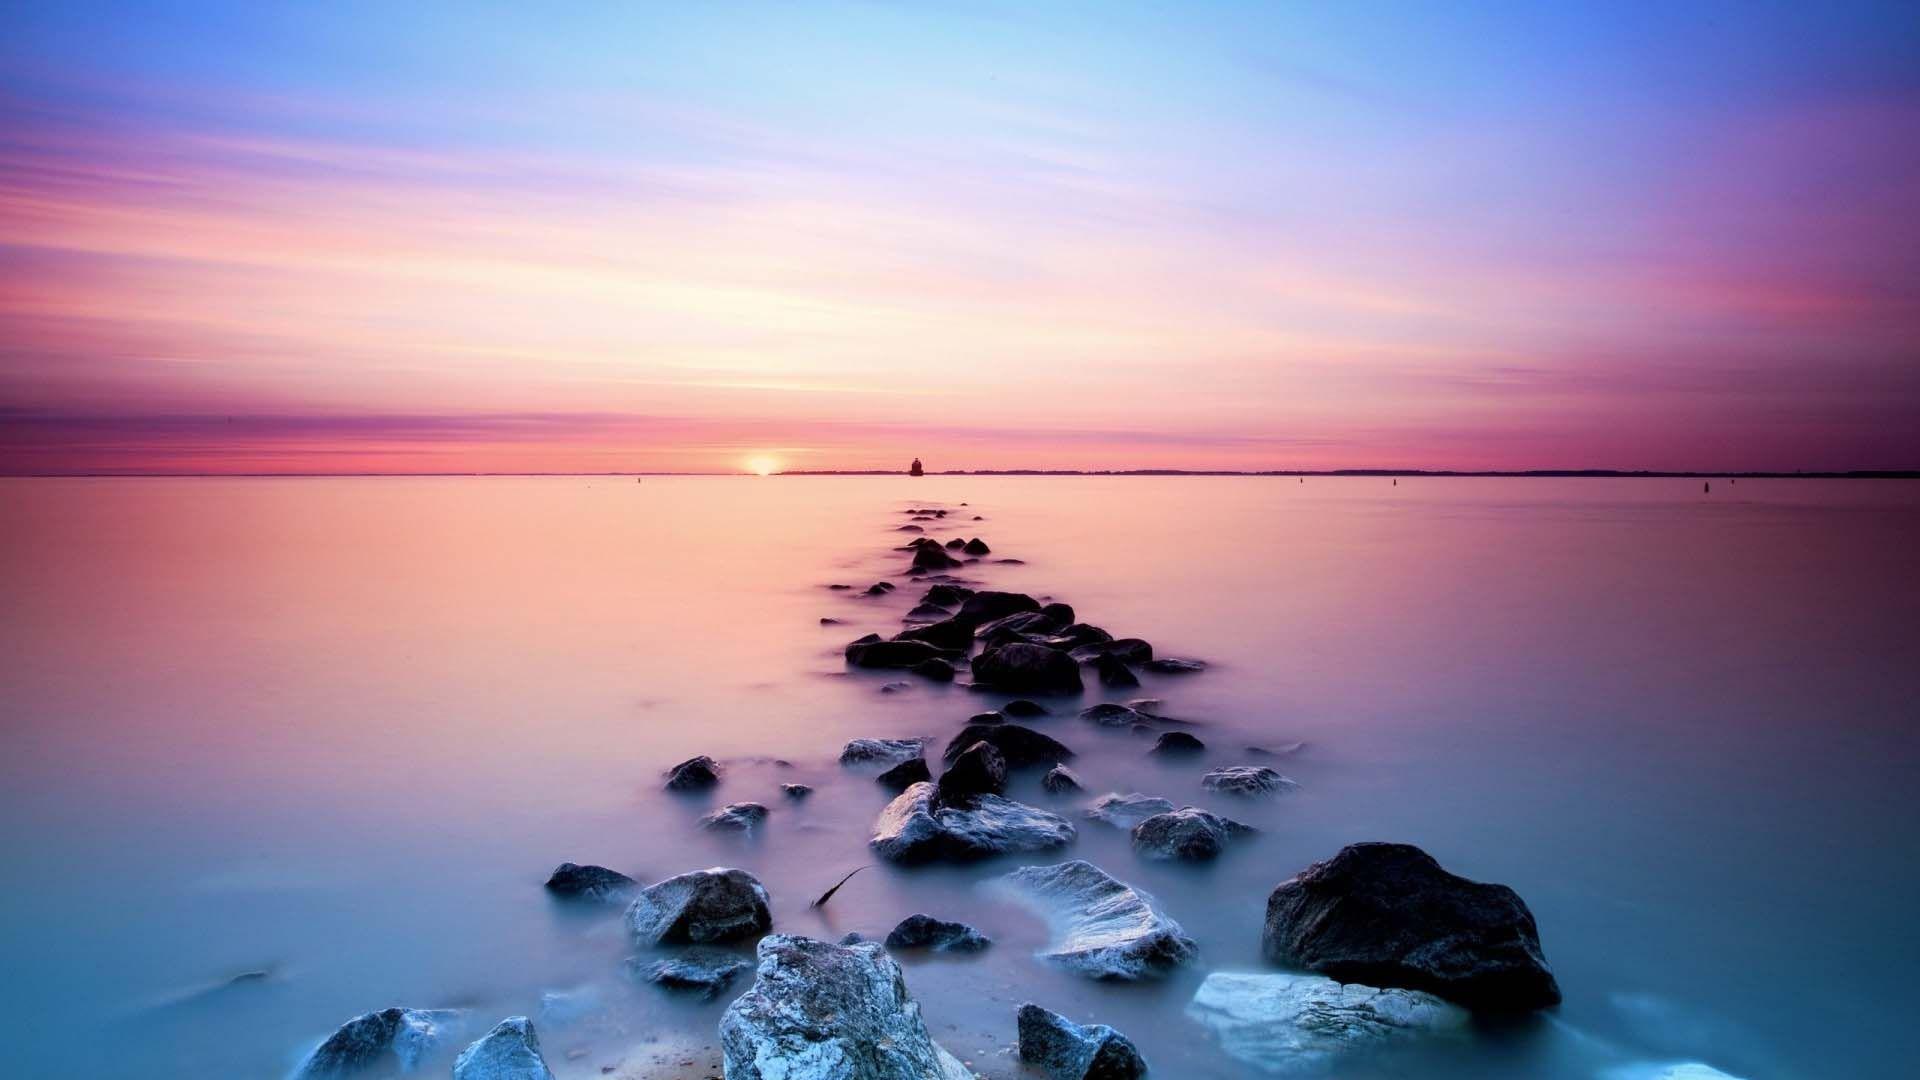 Pastel Wallpaper Sea Stones Hipster Wallpaper Landscape Wallpaper Sunset Wallpaper